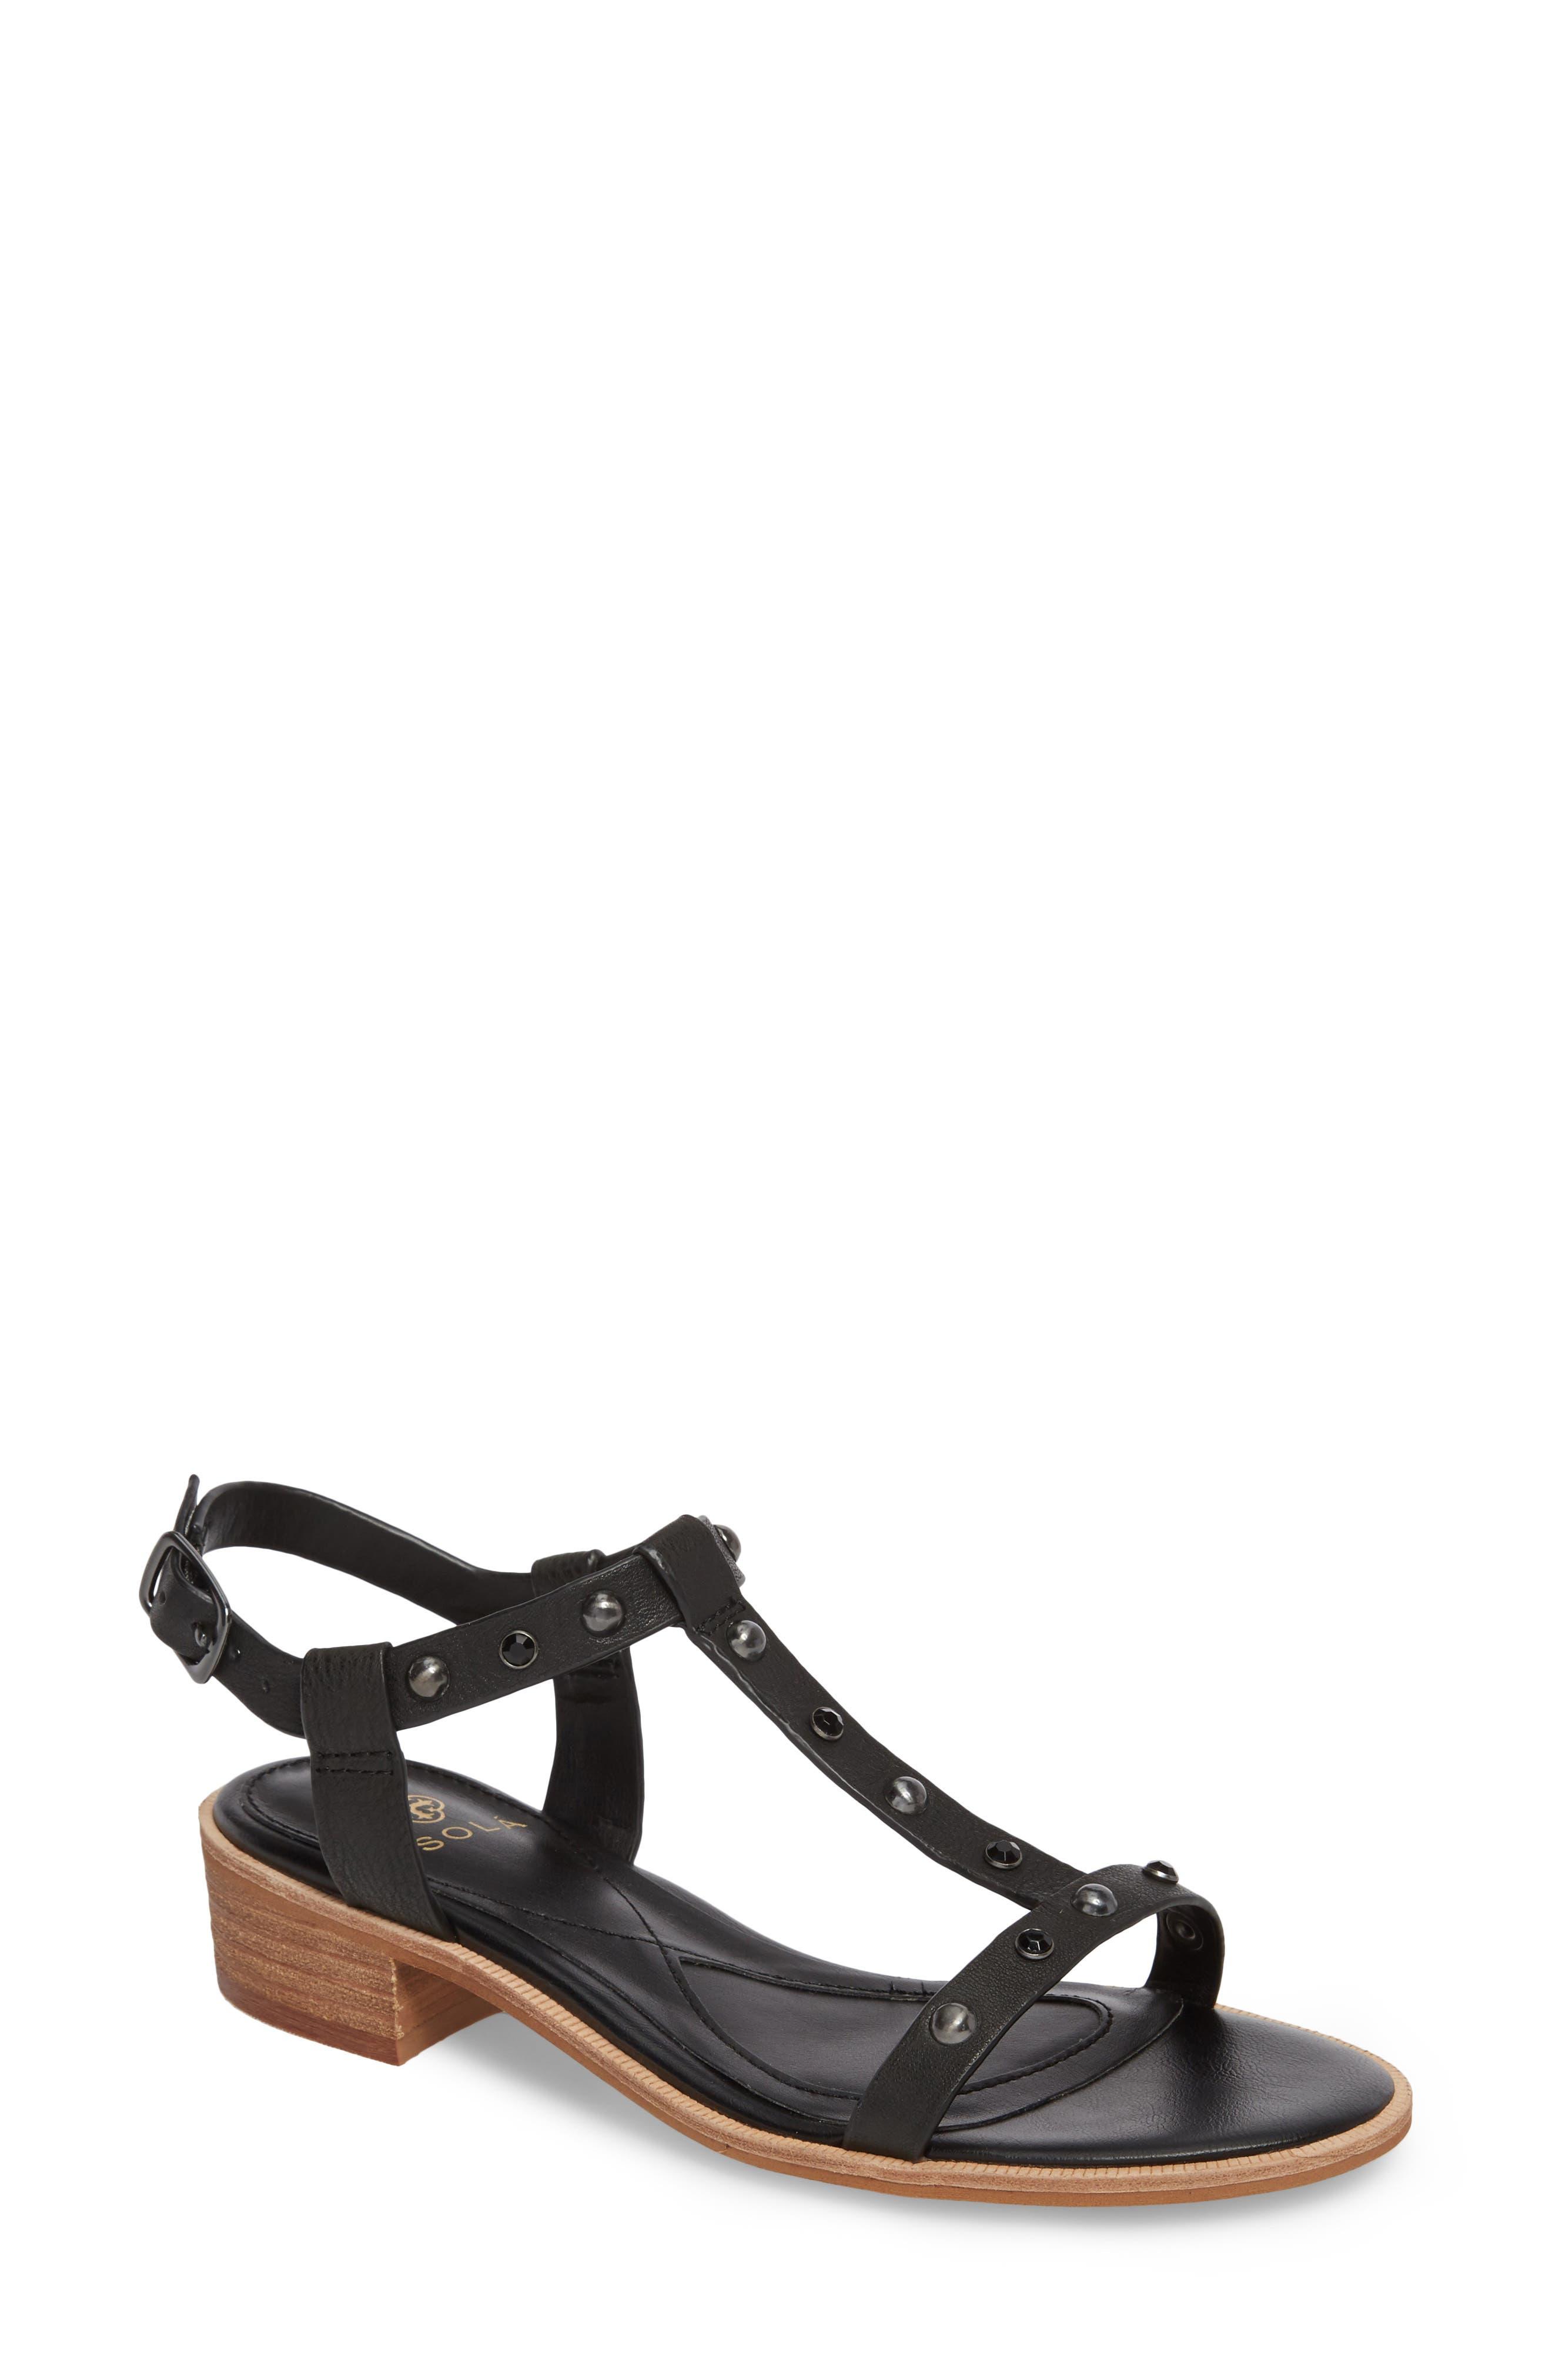 Giana Studded Sandal,                             Main thumbnail 1, color,                             BLACK LEATHER